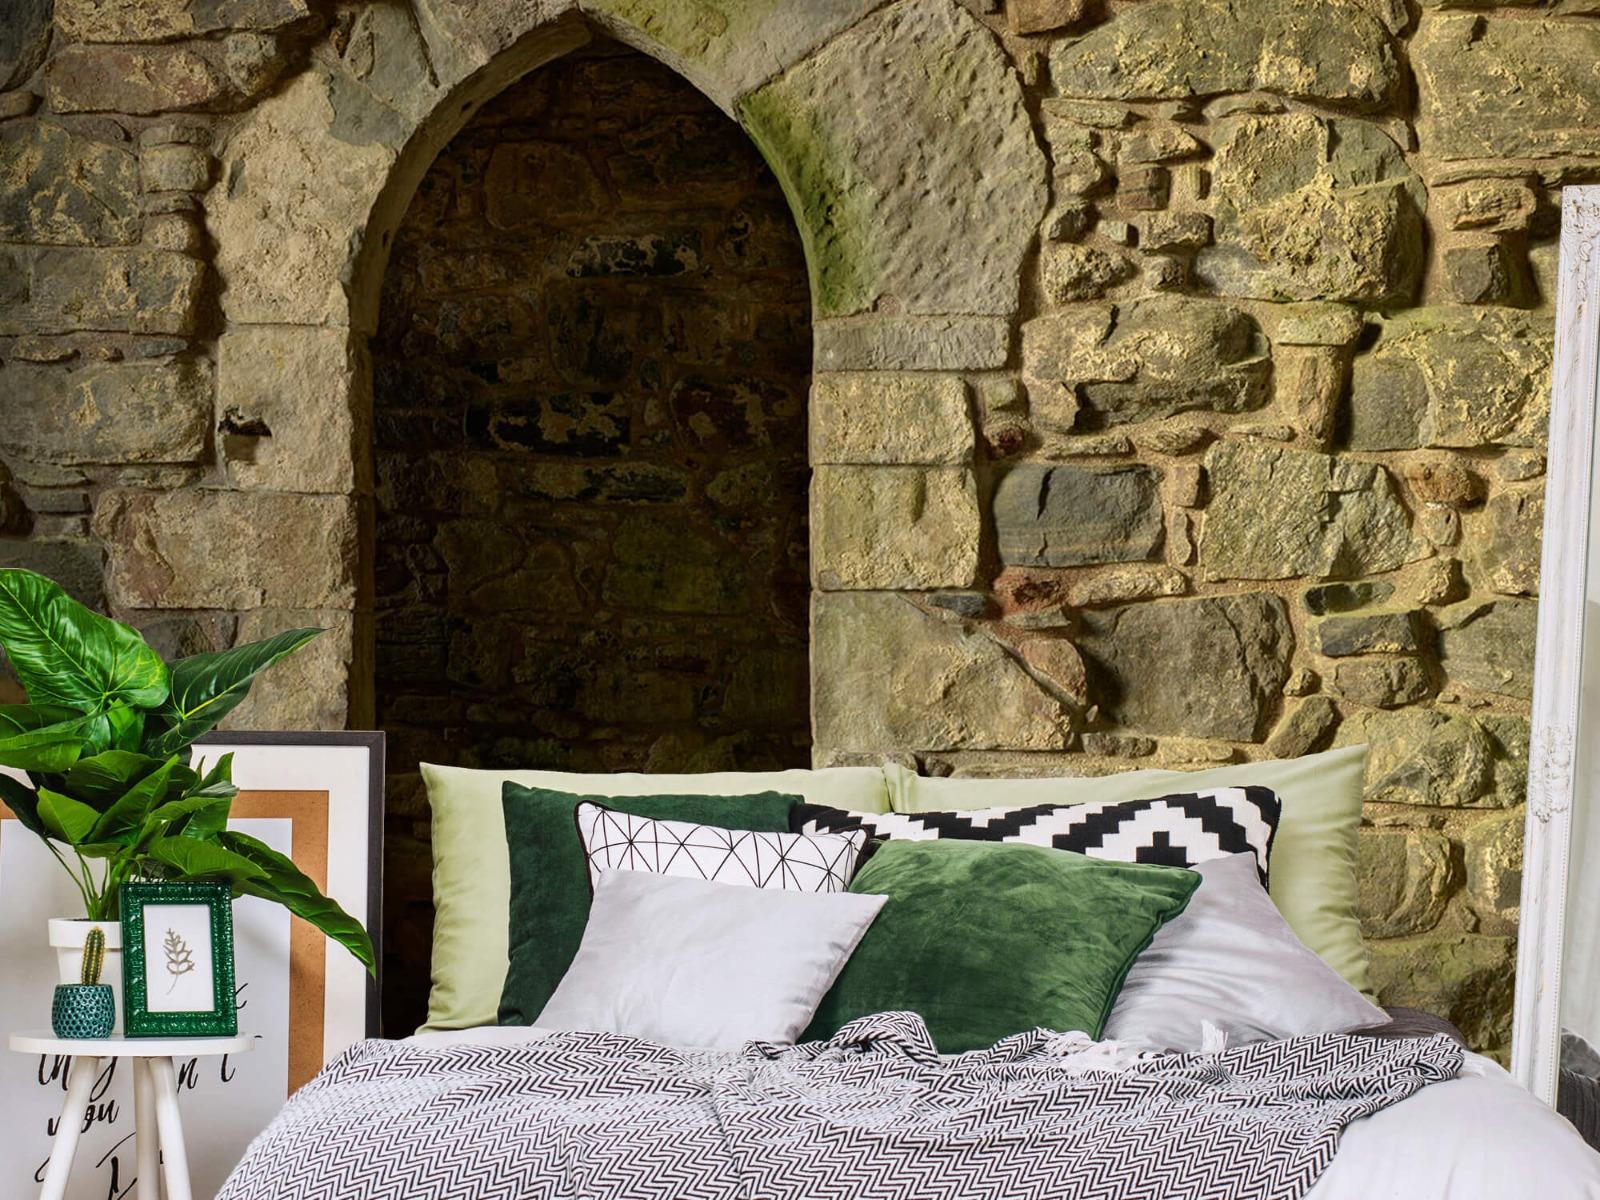 Steen behang - Oude muur met doorgang - Slaapkamer 13